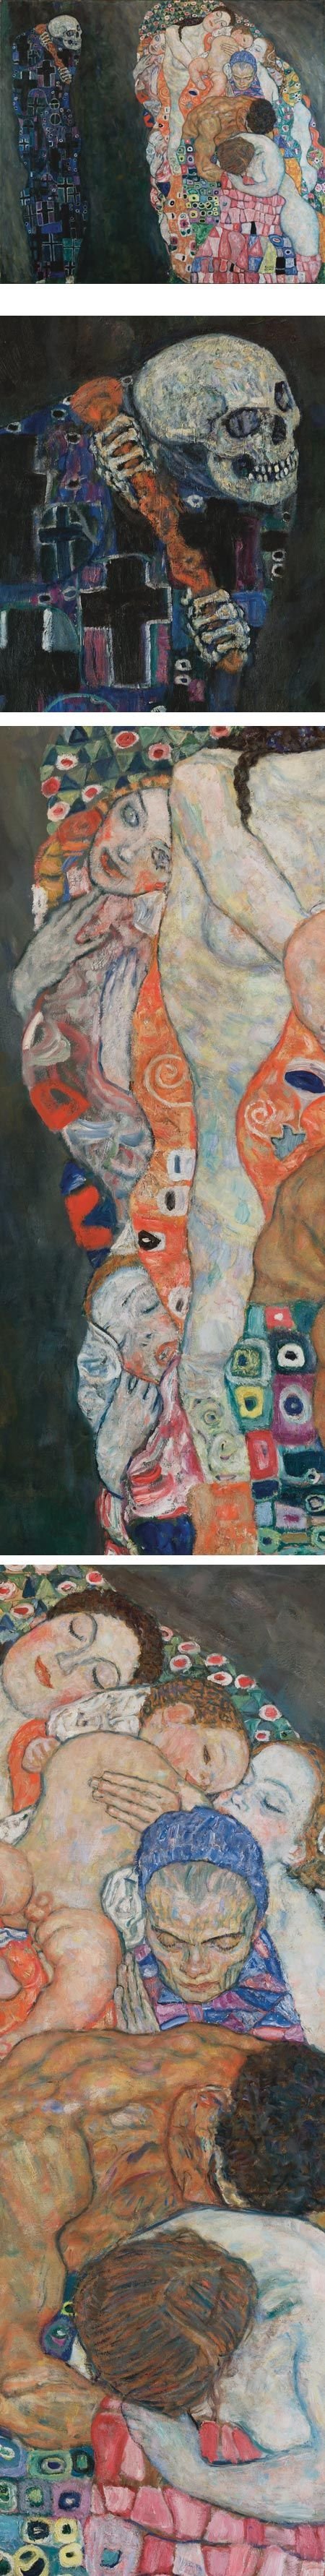 Death and Life, Gustav Klimt